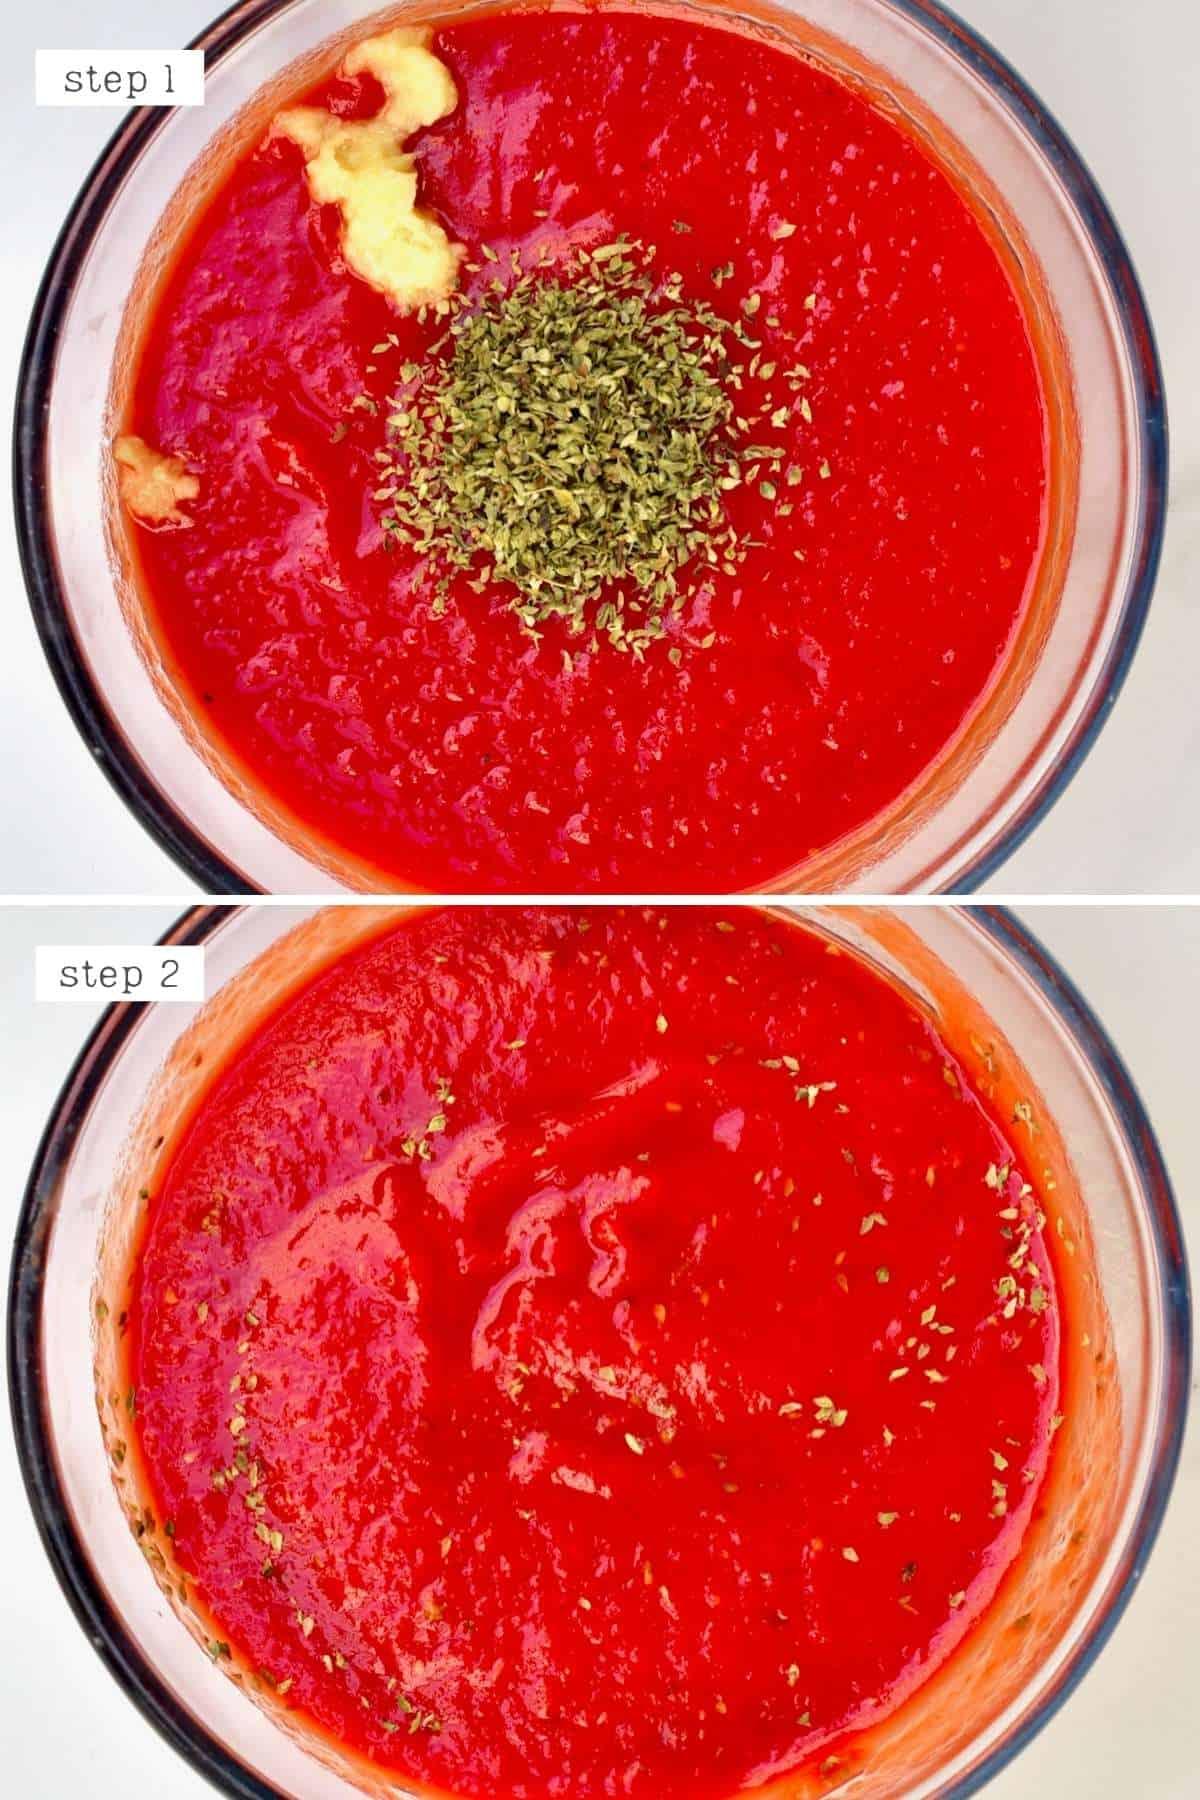 Mixing passata with garlic and oregano